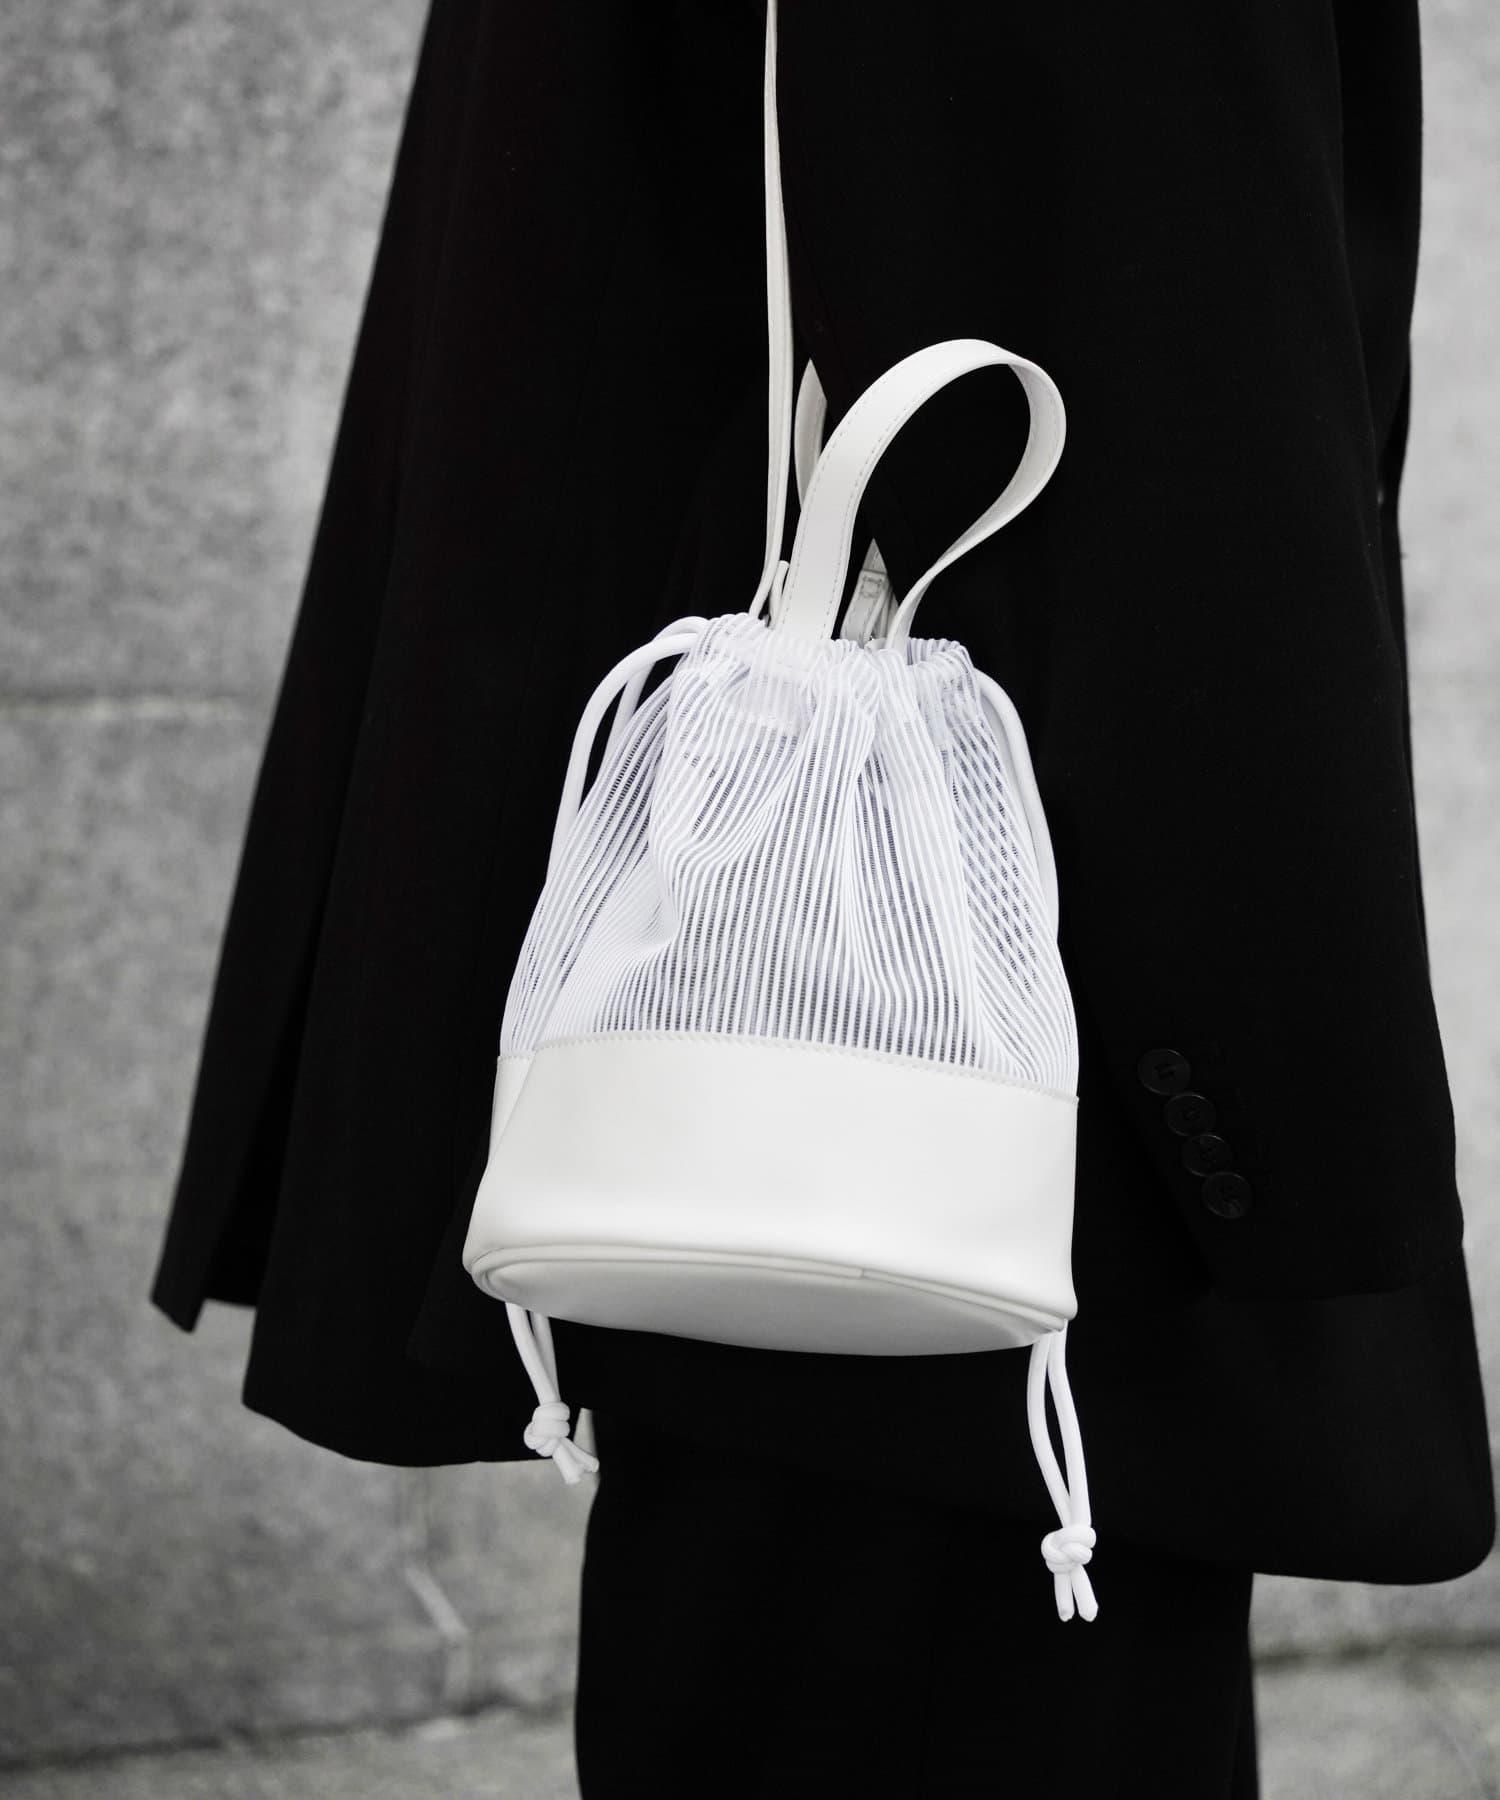 COLONY 2139(コロニー トゥーワンスリーナイン) レディース 【@sakina_yamamoto】メッシュ巾着トートバッグ ホワイト